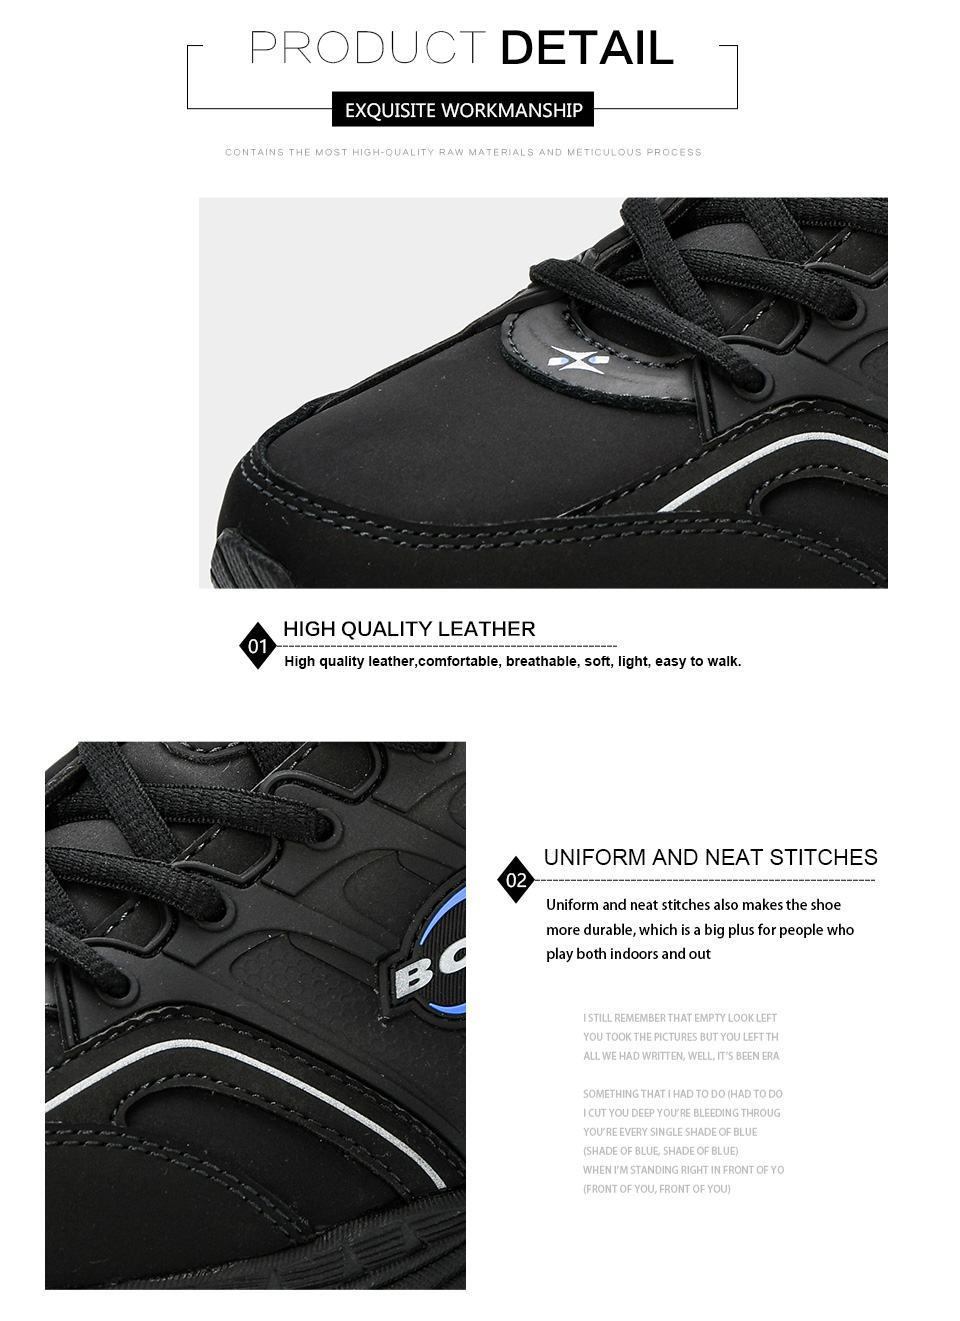 HTB1JvoItaAoBKNjSZSyq6yHAVXaG BONA Men Casual Shoes Microfiber Man Flats Lace Up Breathable Men Fashion Classic Outdoor Shoes Zapatos De Hombre Free Shipping